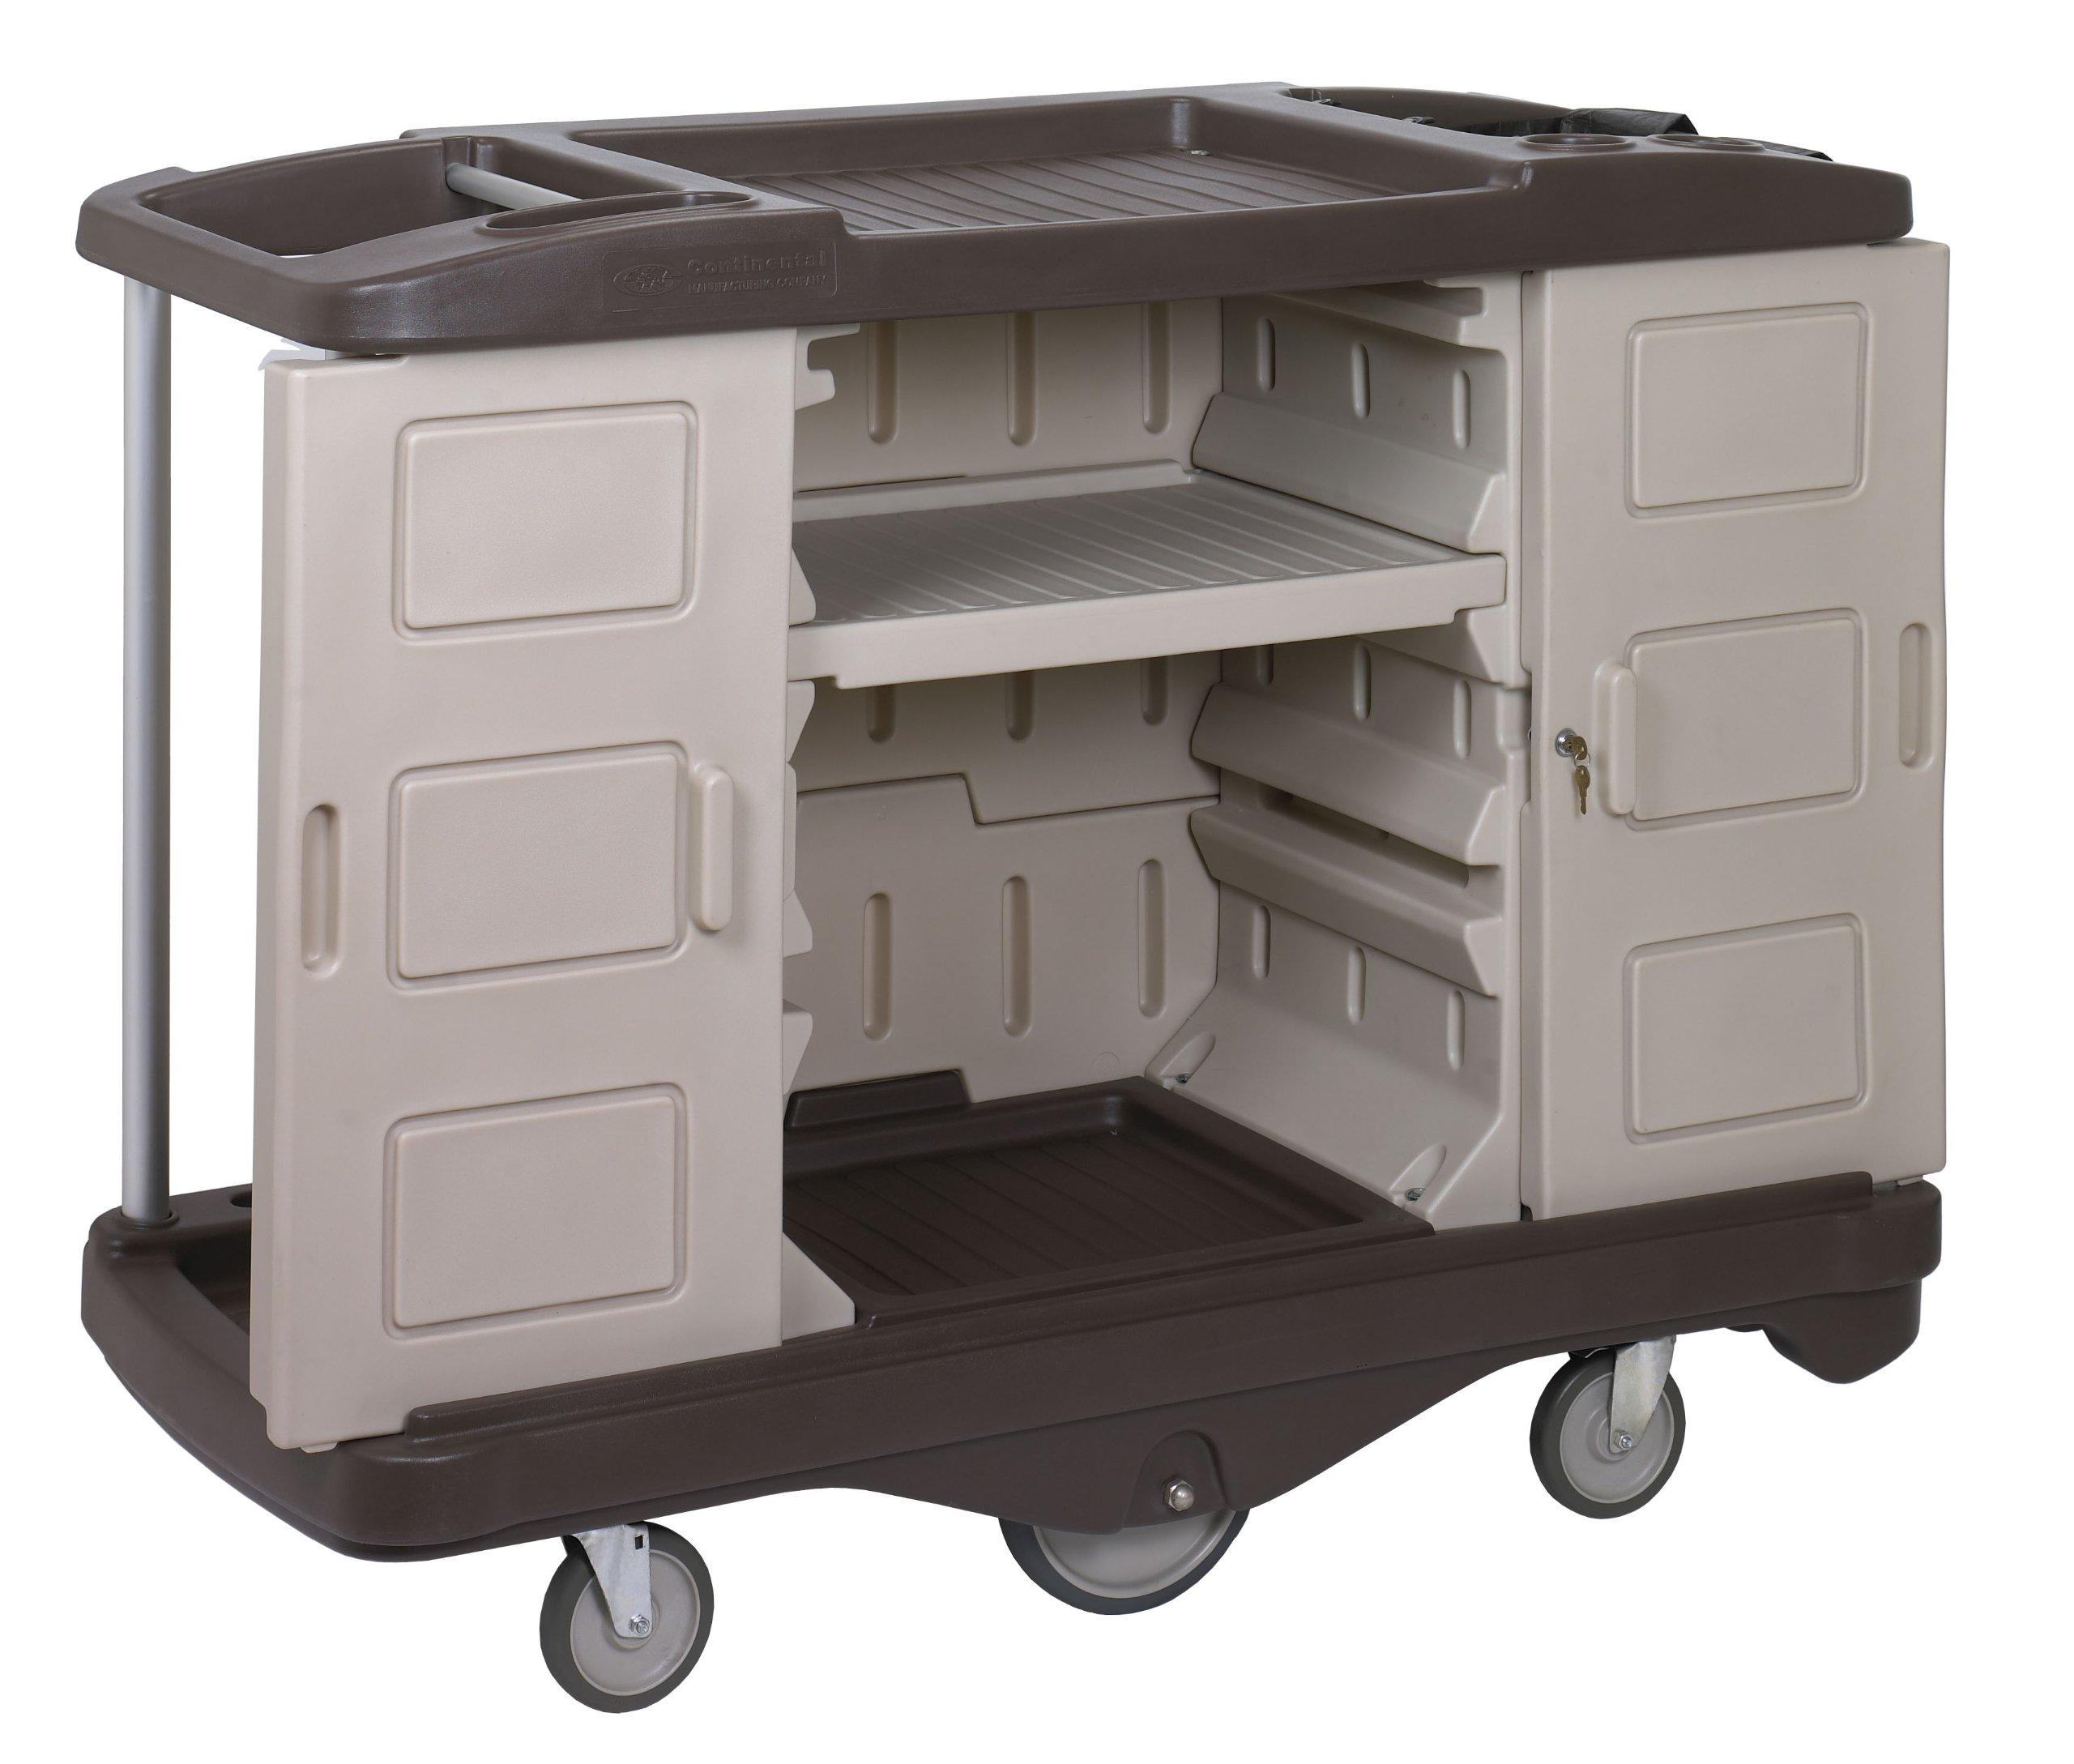 Continental 1585BEBN, Beige/Brown Deluxe Lodging Cart (Case of 1)